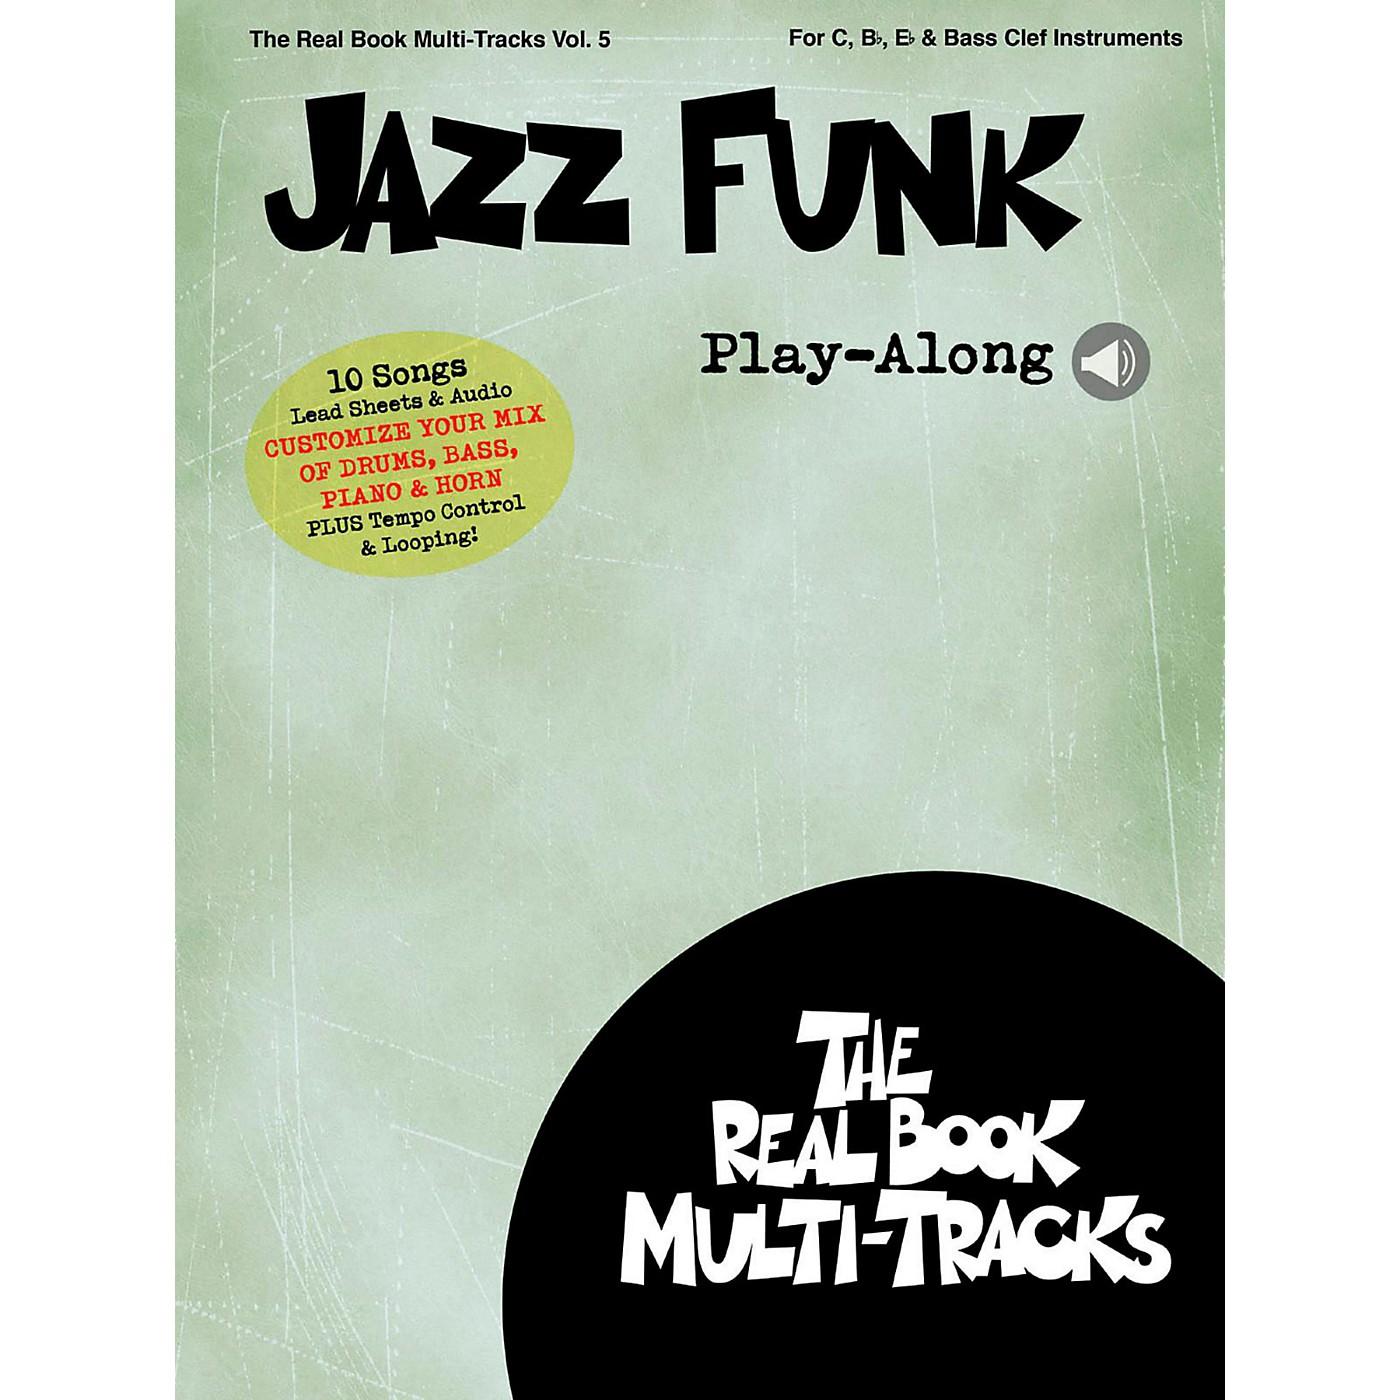 Hal Leonard Jazz Funk Play-Along - Real Book Multi-Tracks Vol. 5 thumbnail